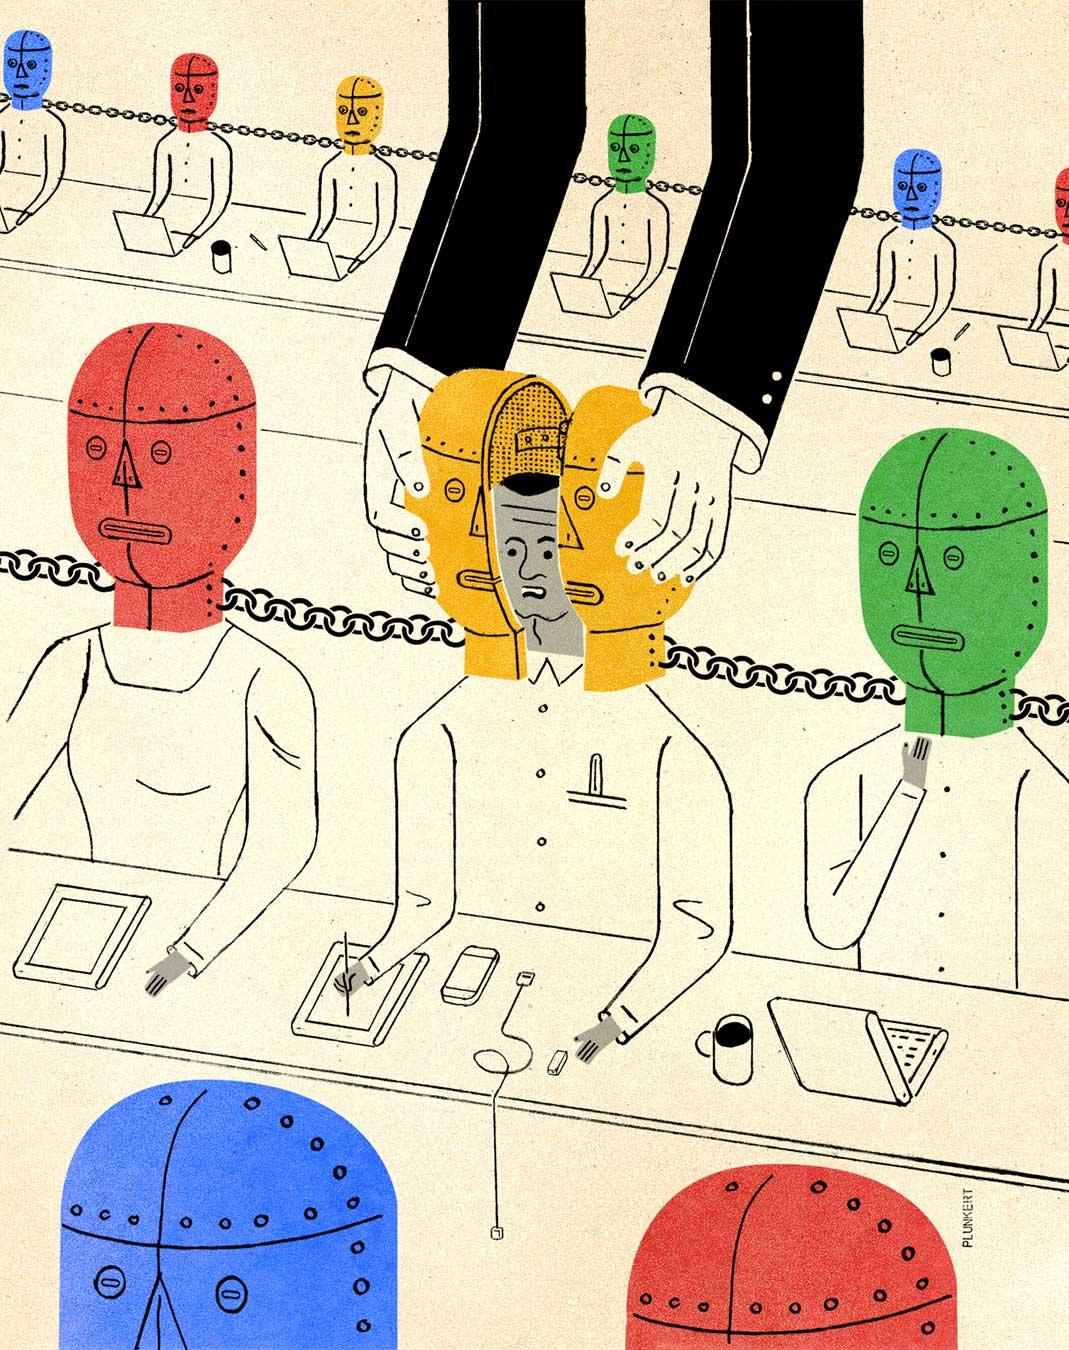 David Plunkert / Is Uber Stealing Google's IP? / The New Yorker